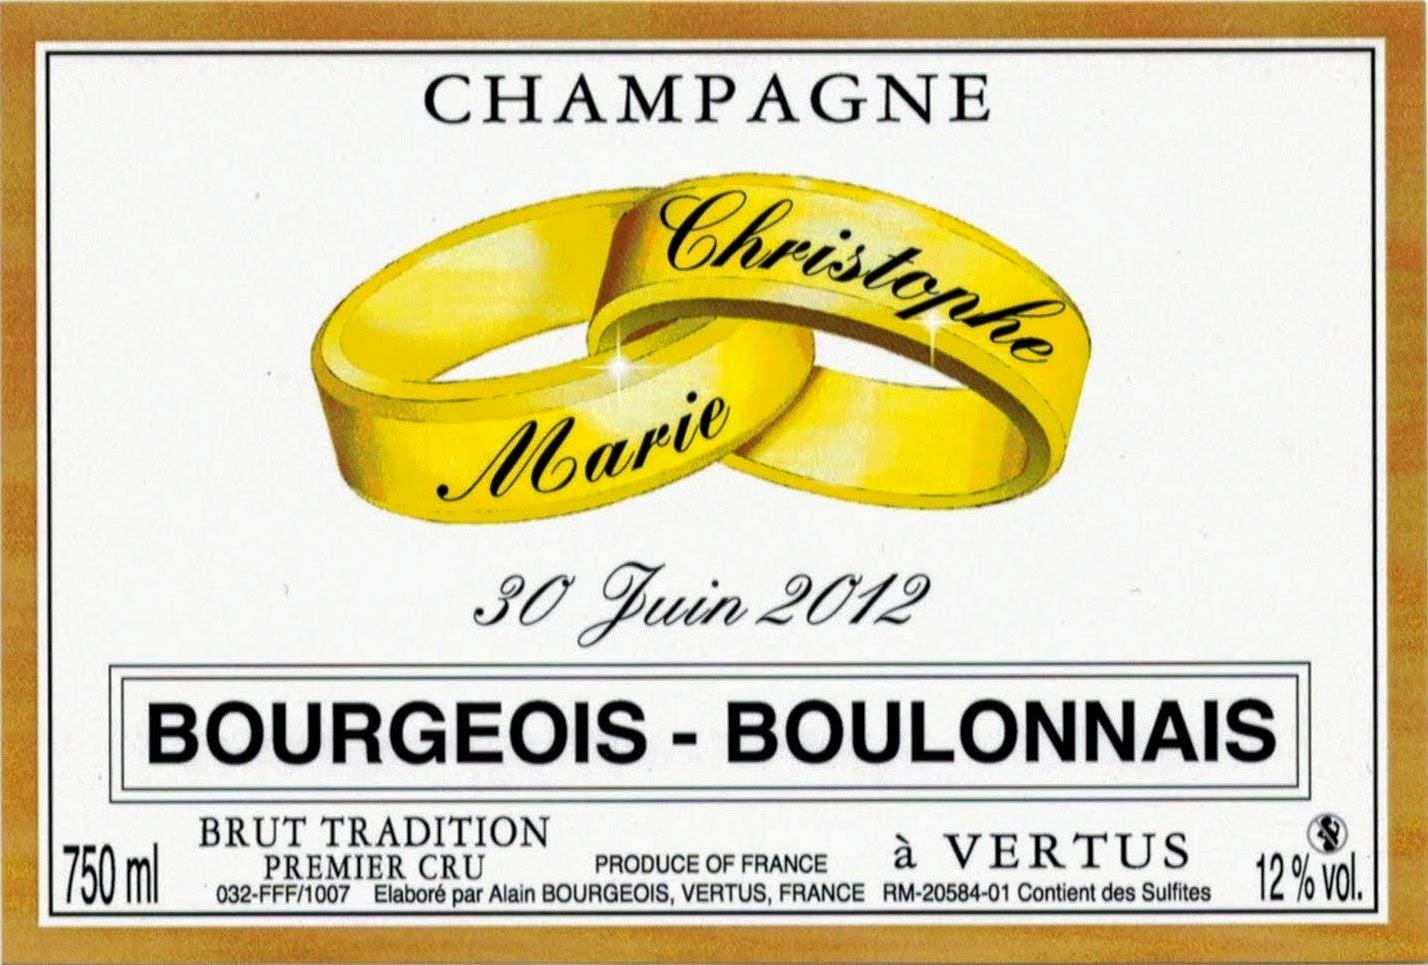 etiquette champagne personnalise mariage alliances - Tiquette Personnalise Champagne Mariage